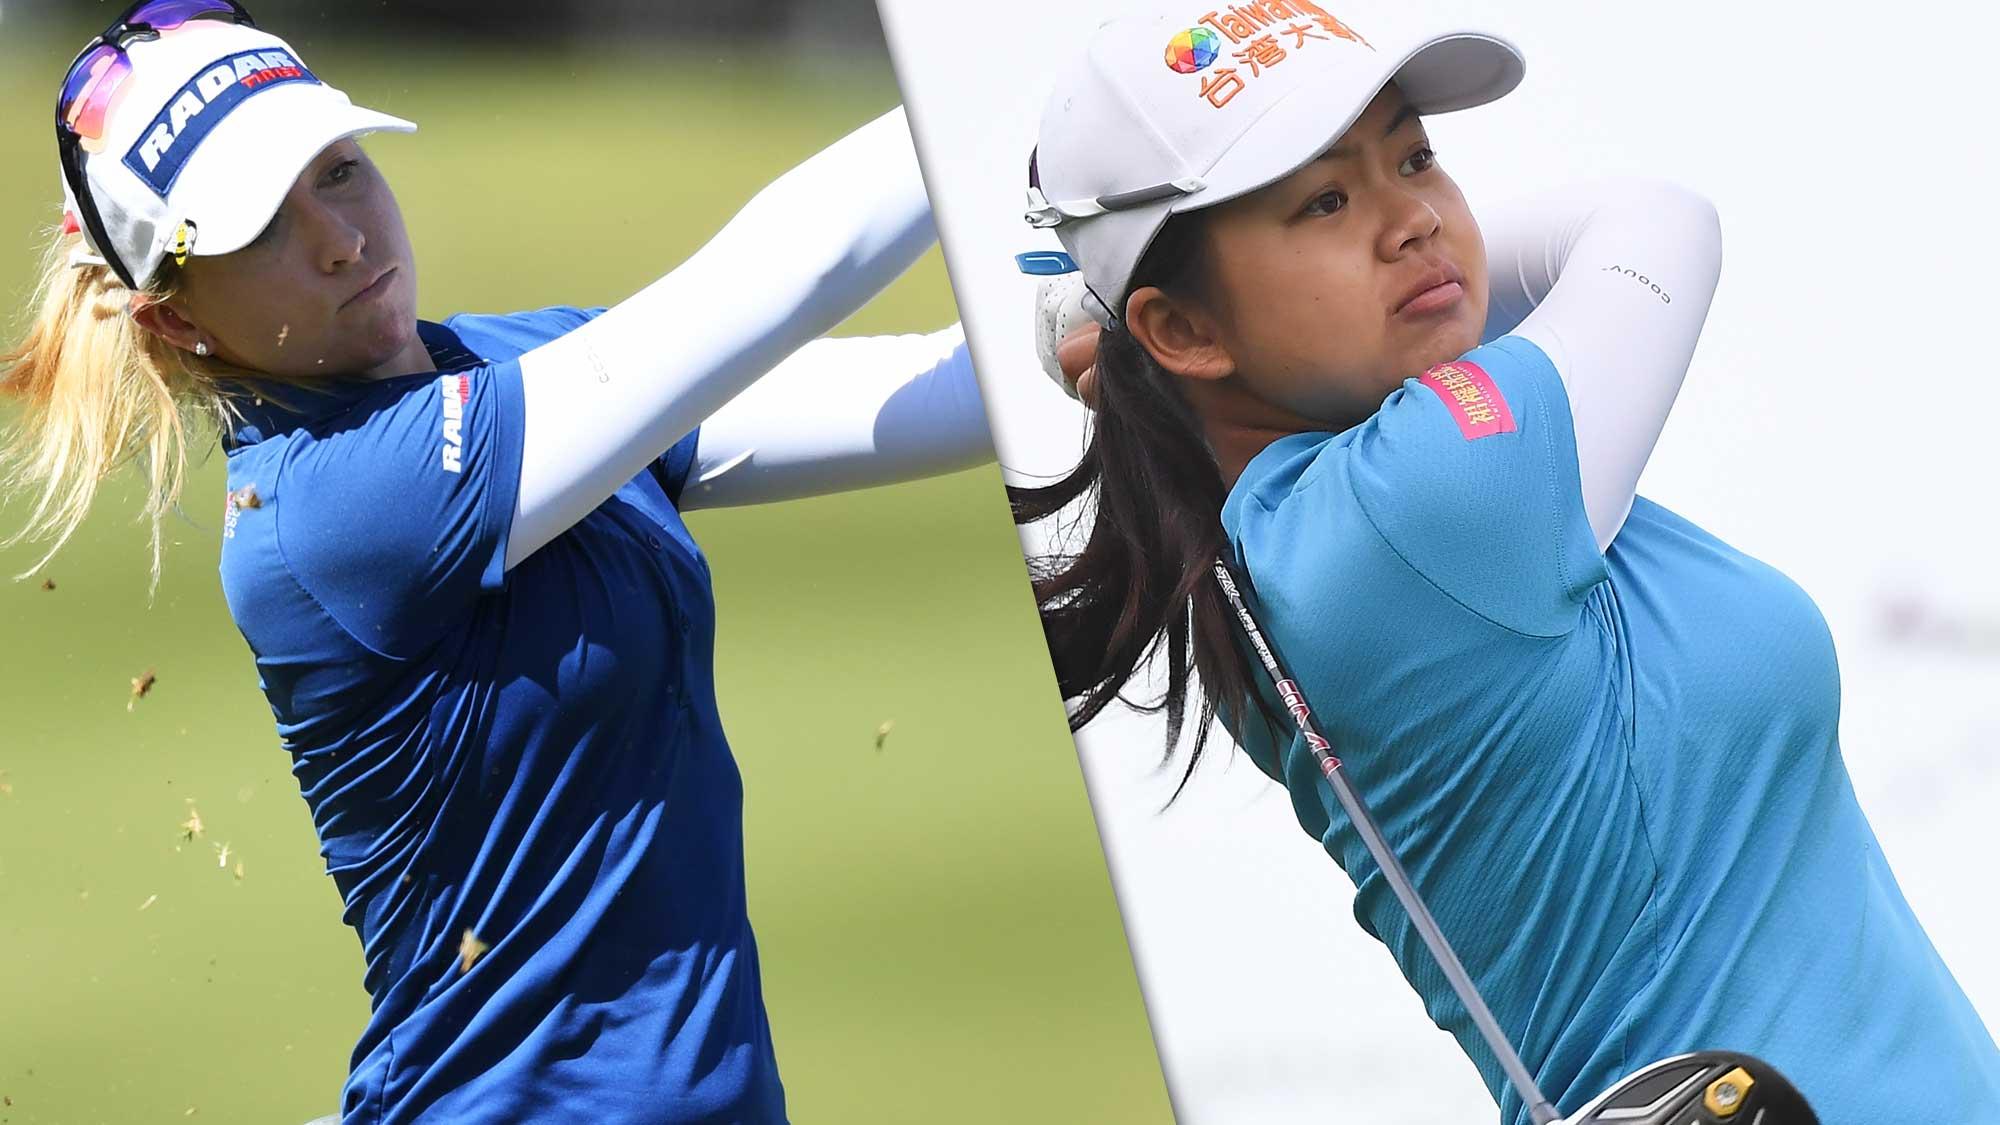 australian open 2019 winner golf